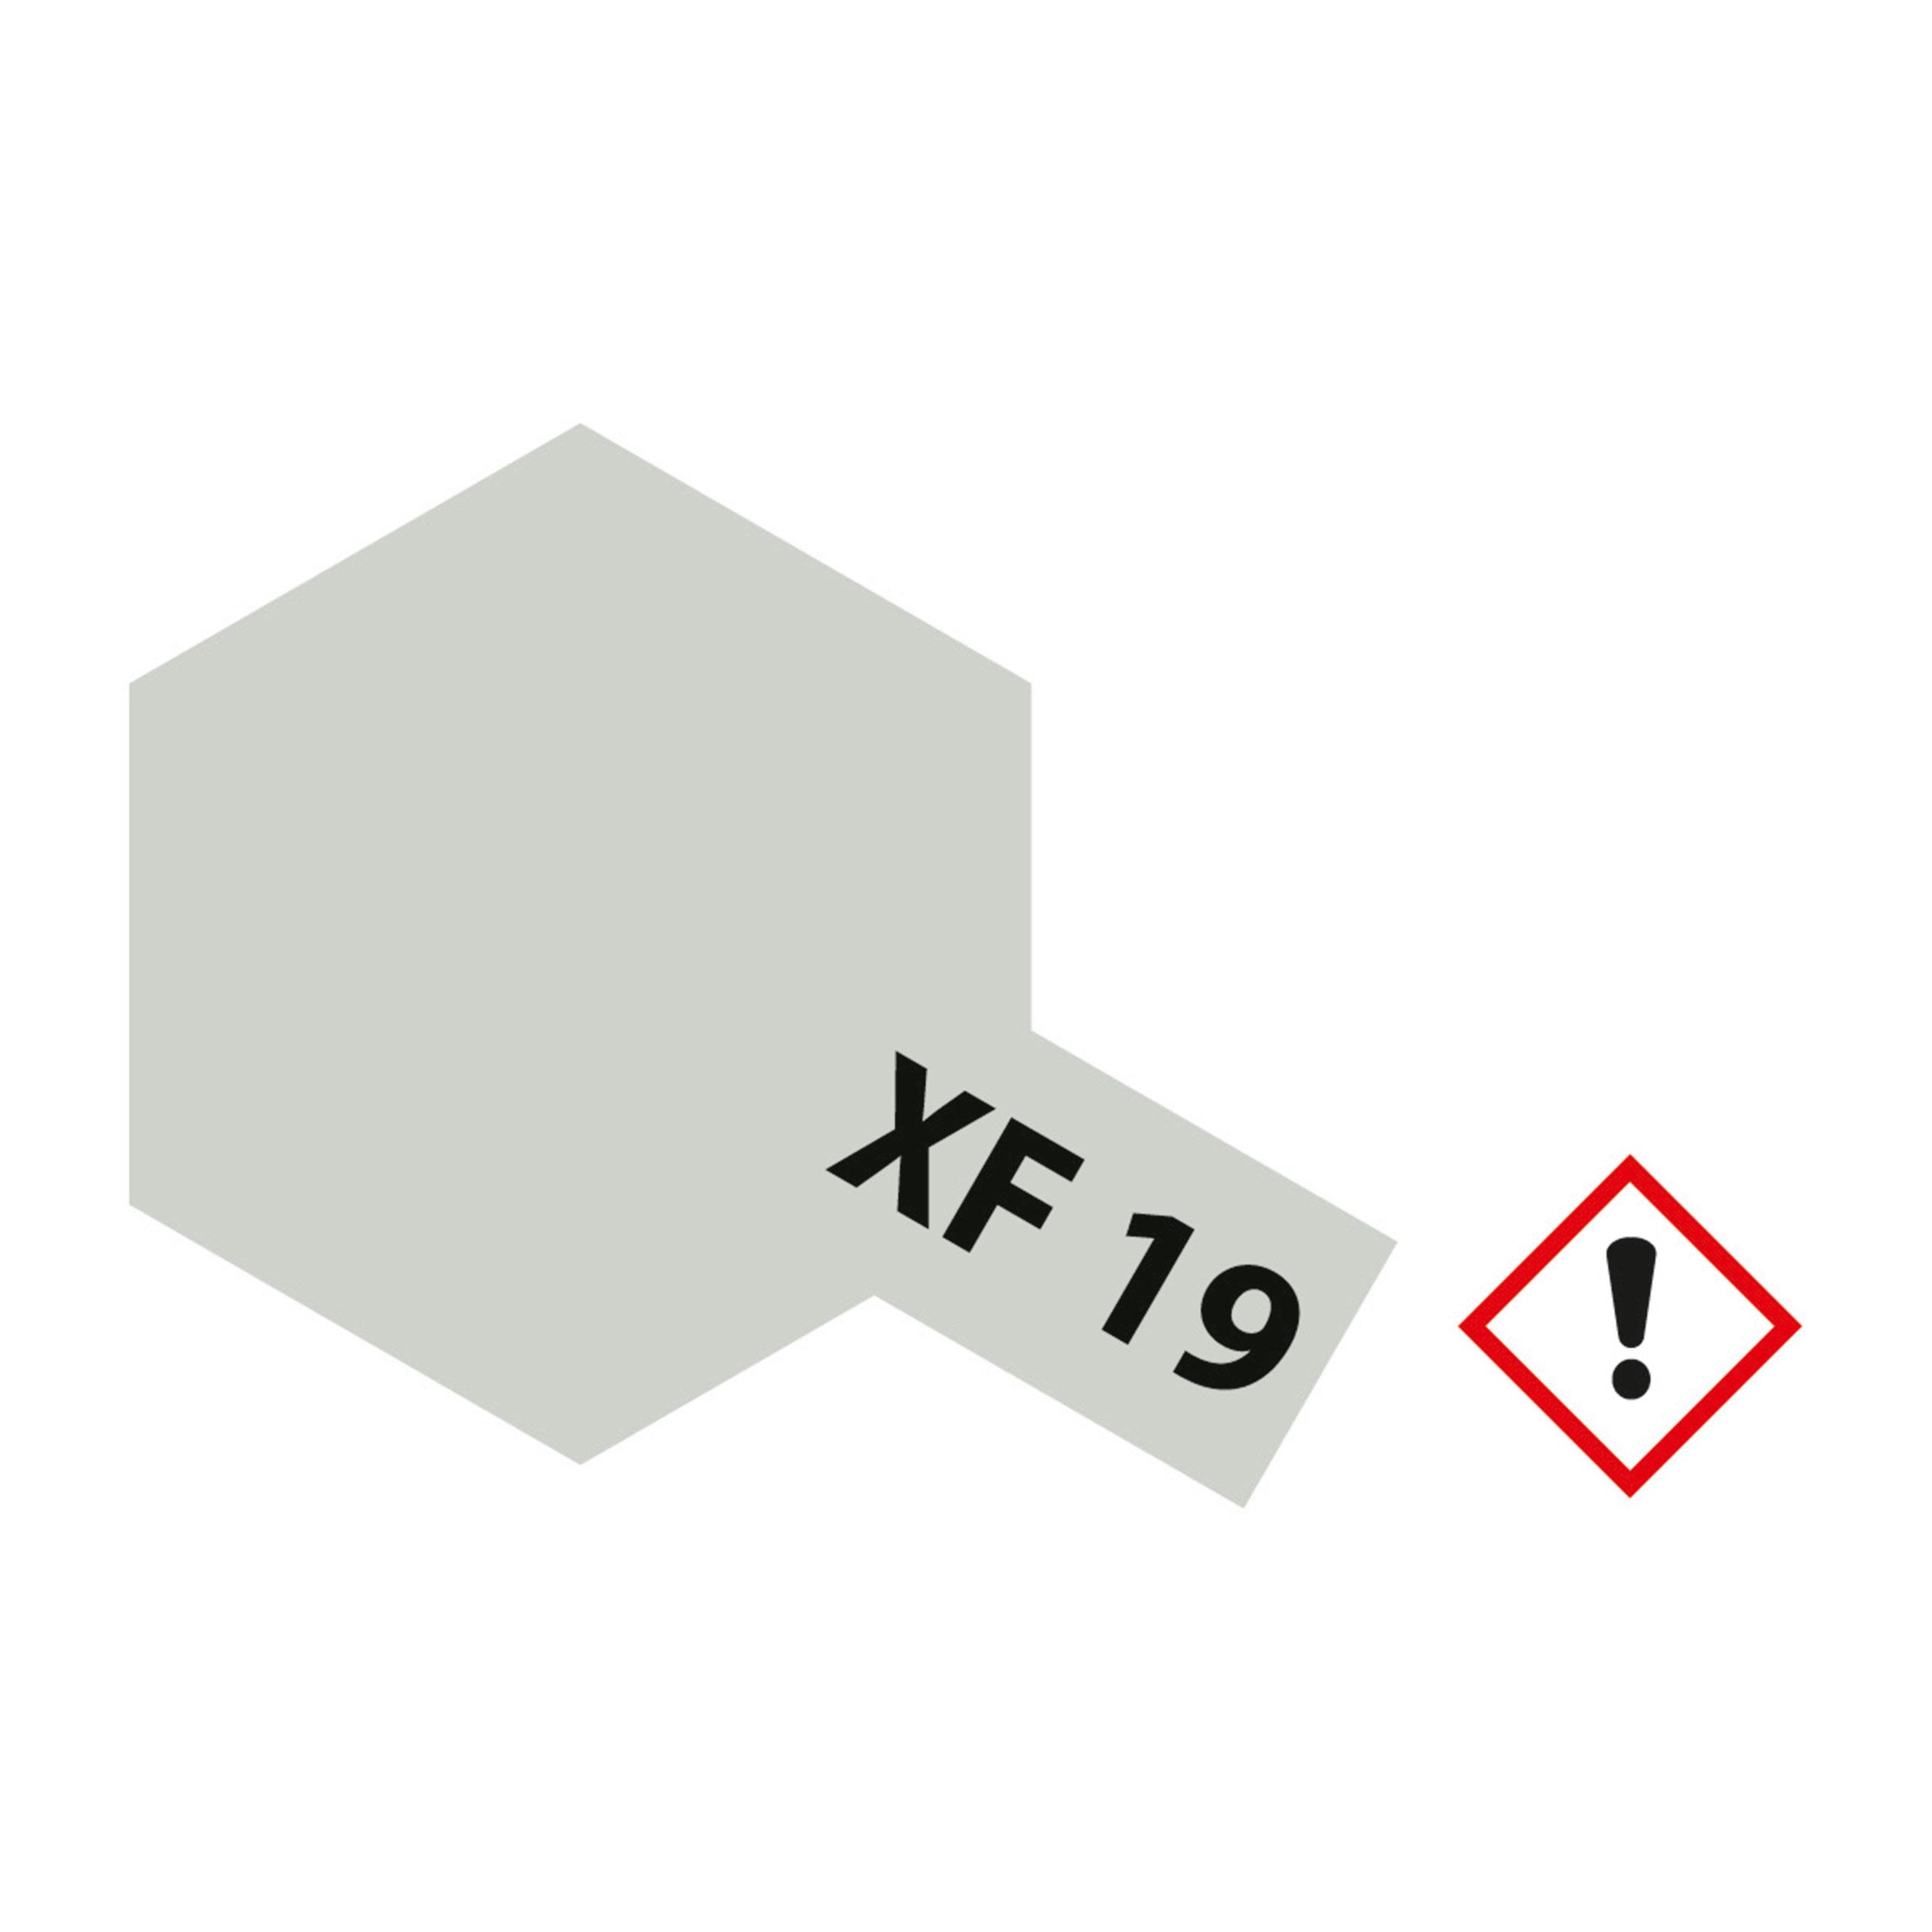 XF-19 Himmelgrau matt - 23ml Acrylstreichfarbe wasserloeslich Tamiya 300081319